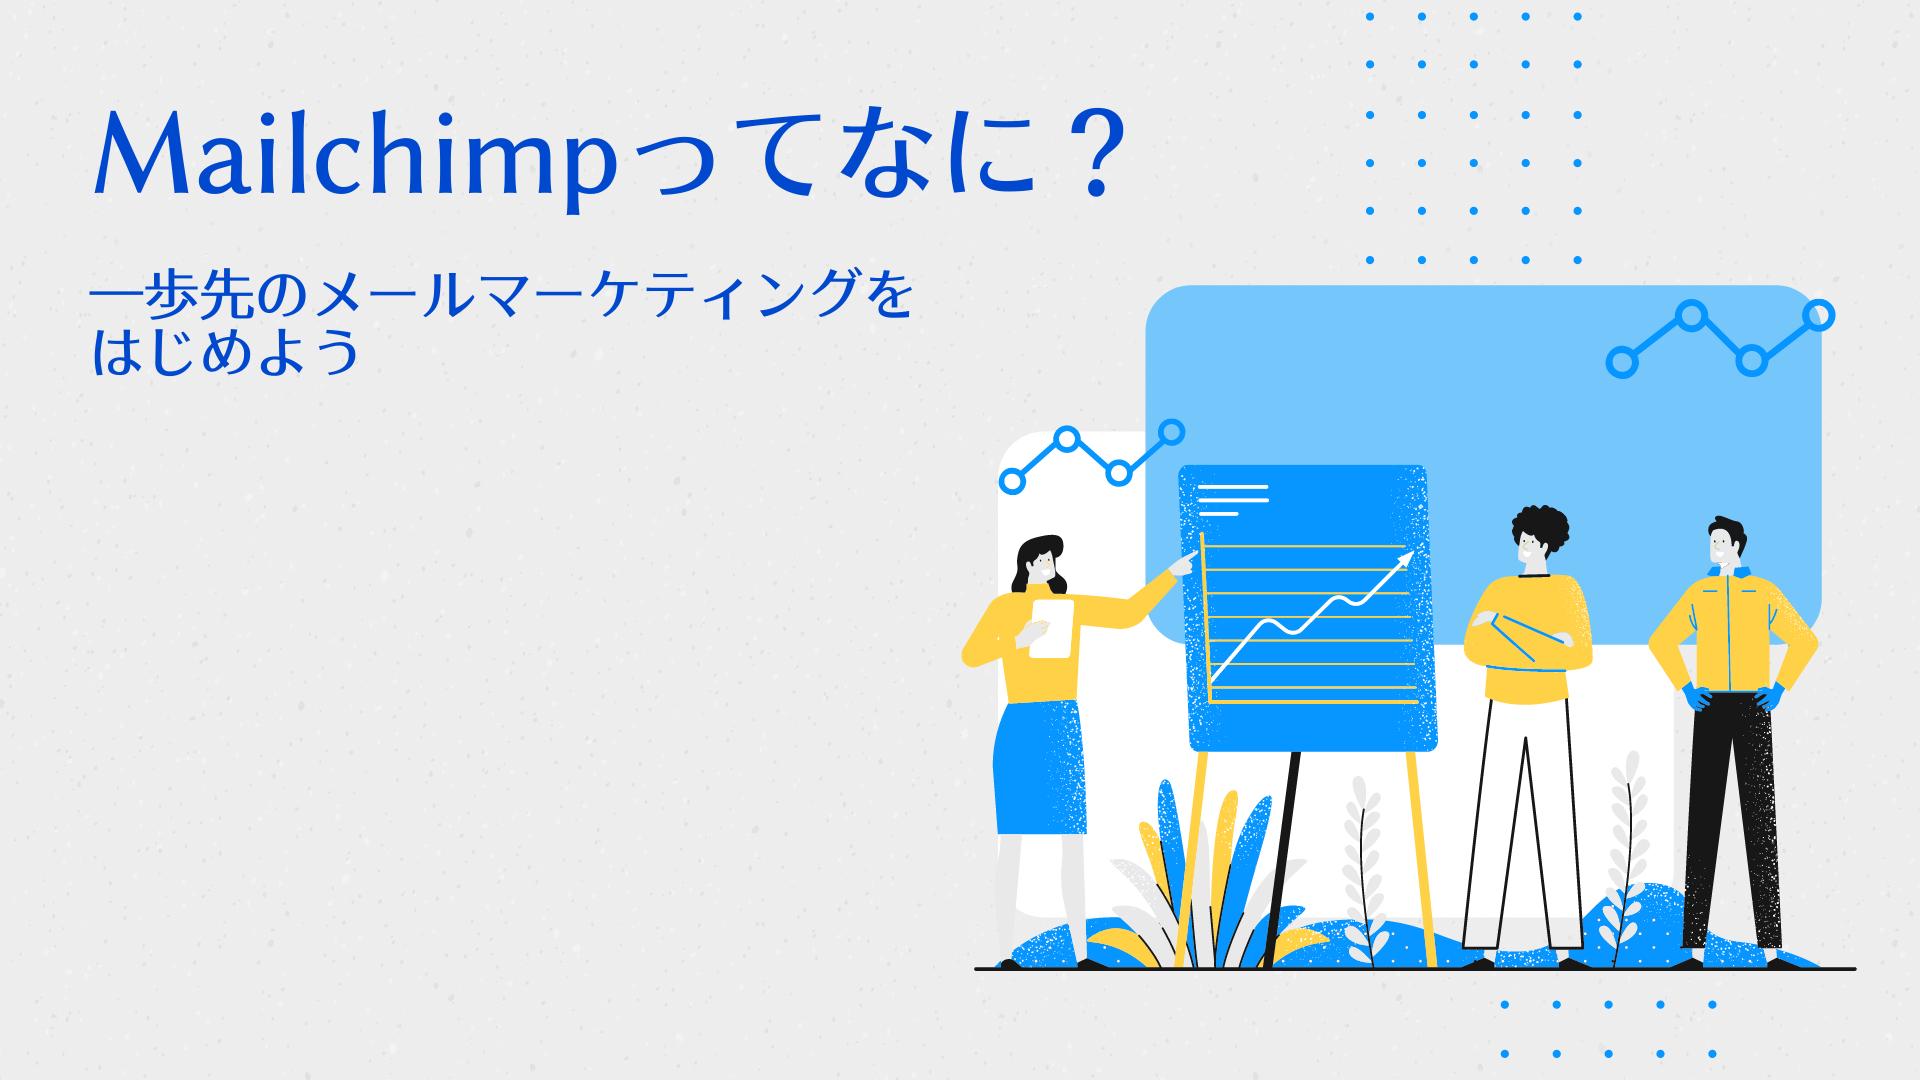 Mailchimpとは?初心者にオススメ!無料で使えるメール配信システム (1)